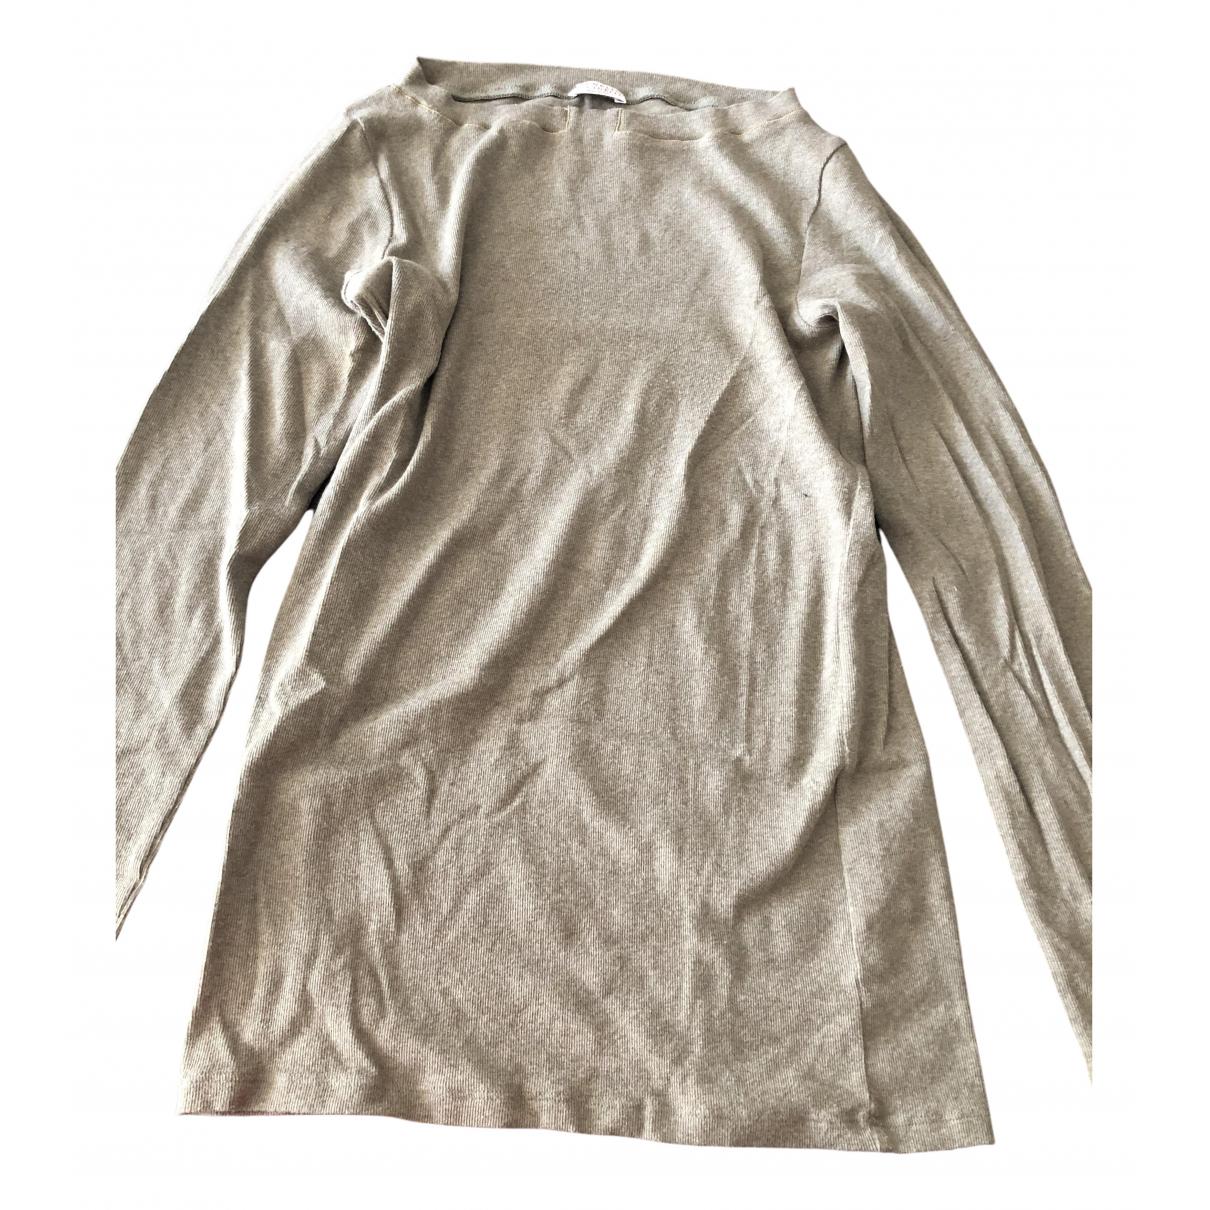 Brunello Cucinelli \N Beige Cotton Knitwear for Women XL International